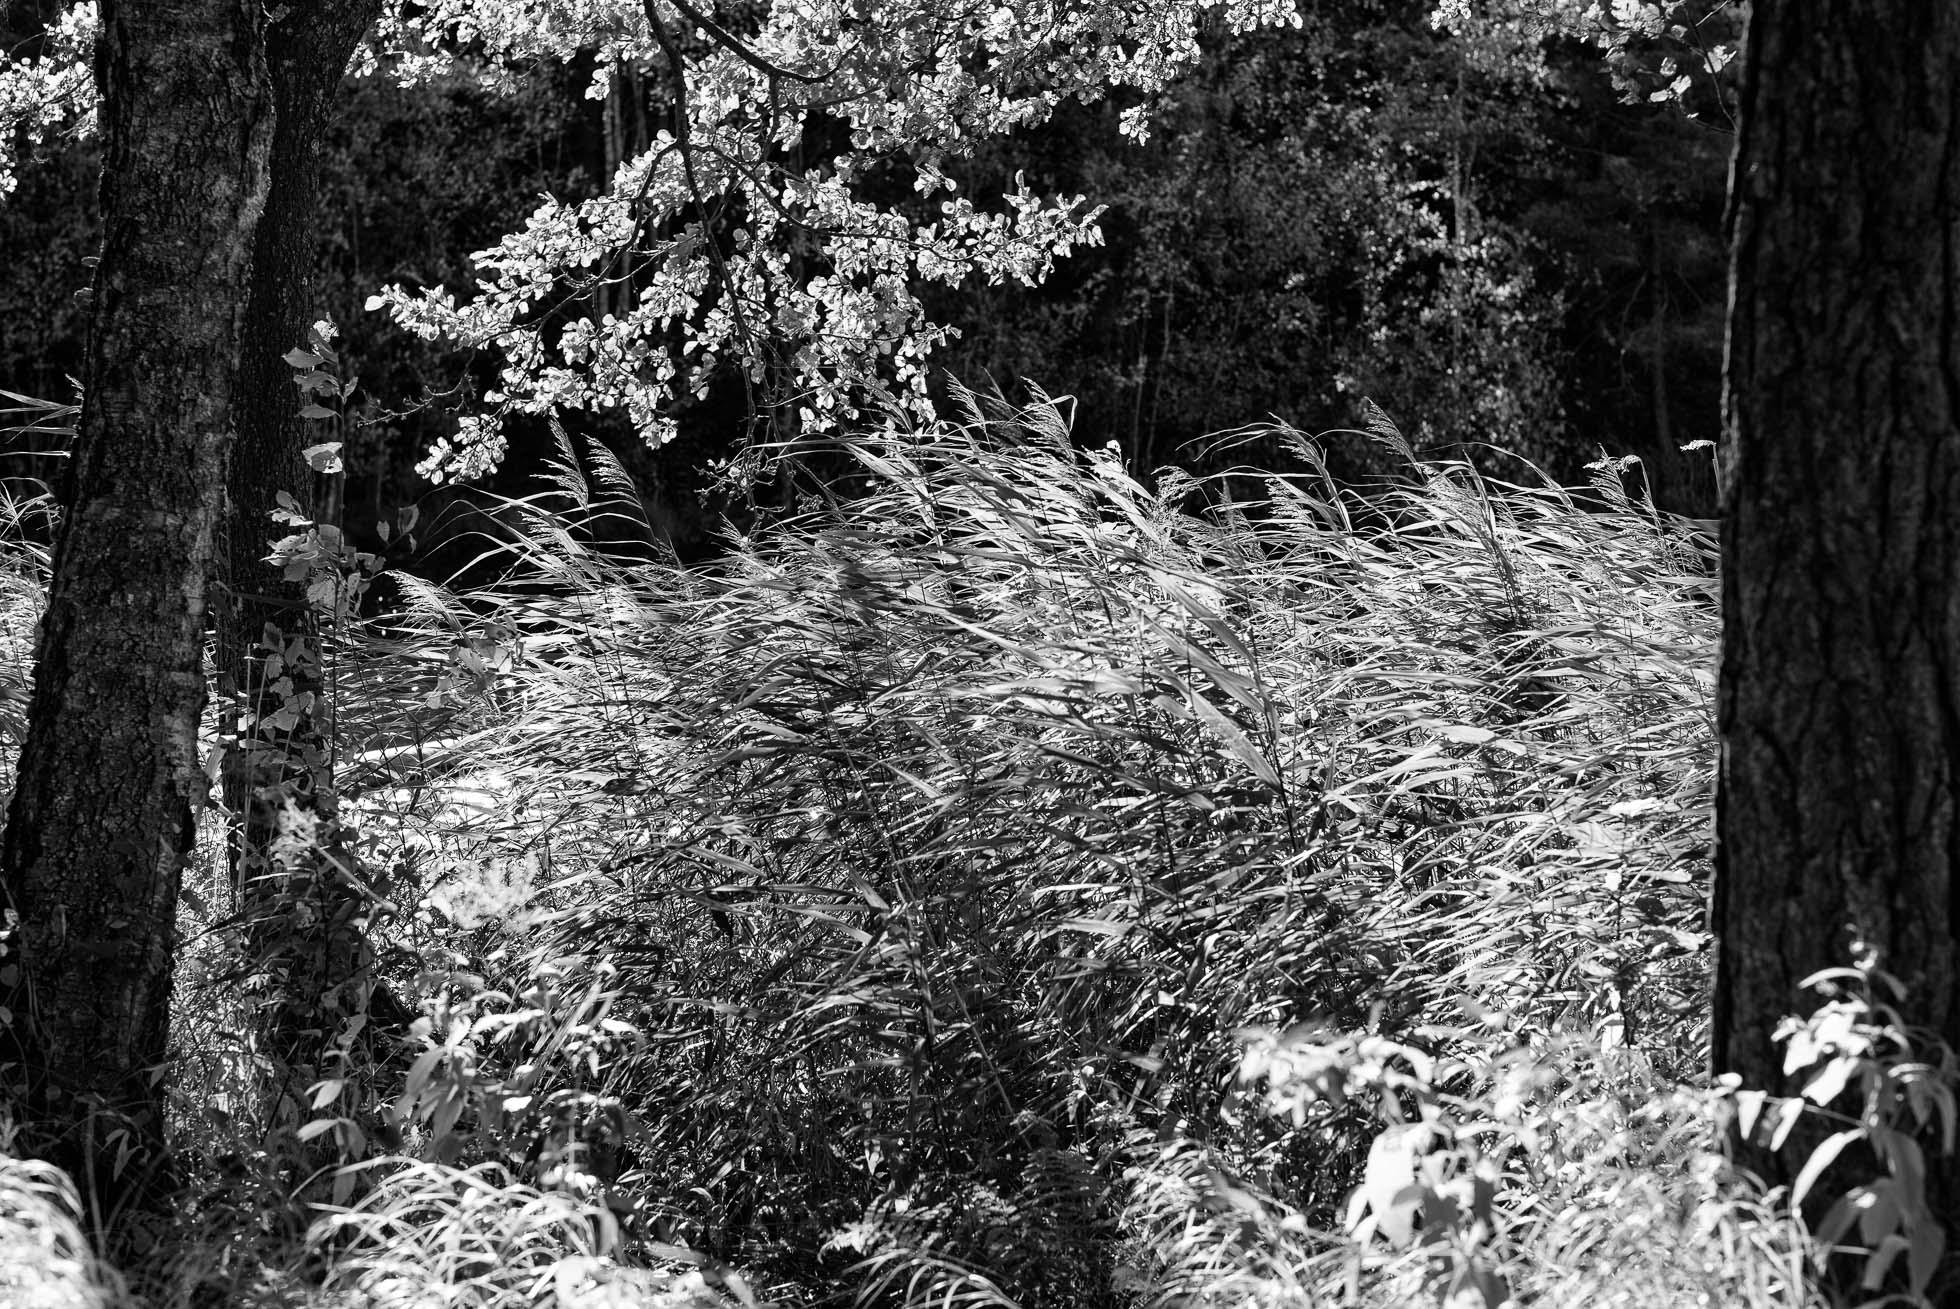 2016-10-01-skogspromenad-mortsjon__2016-10-01__0057-redigera